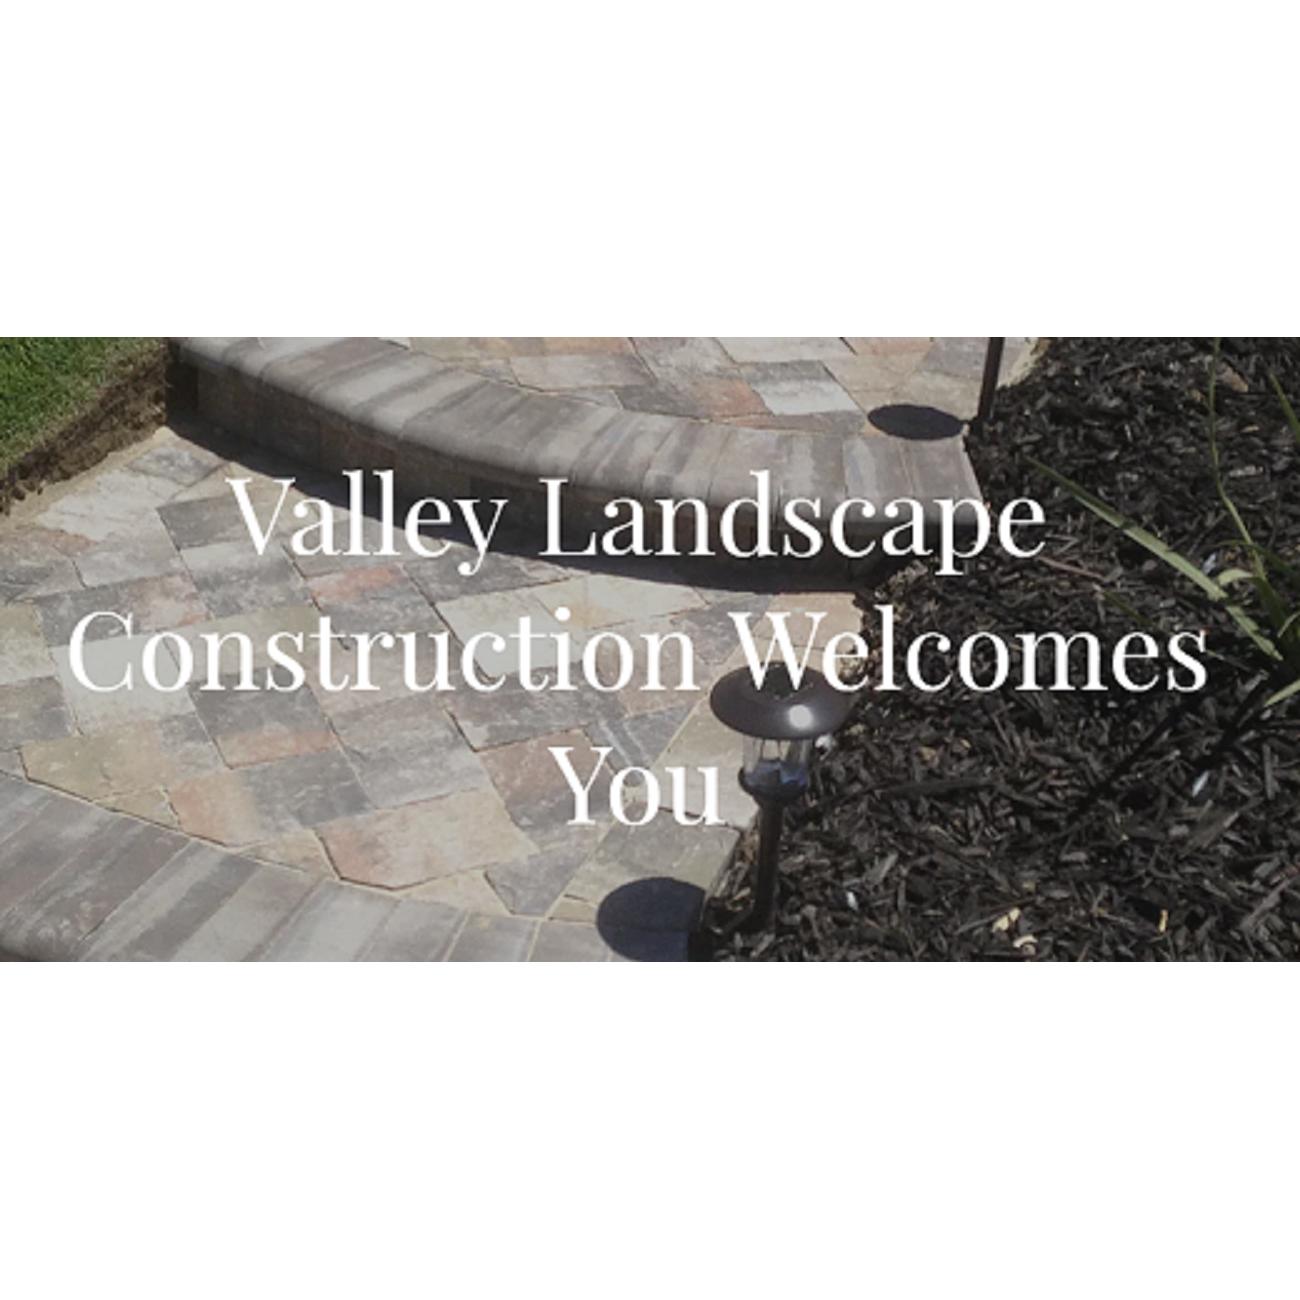 Valley Landscape Construction